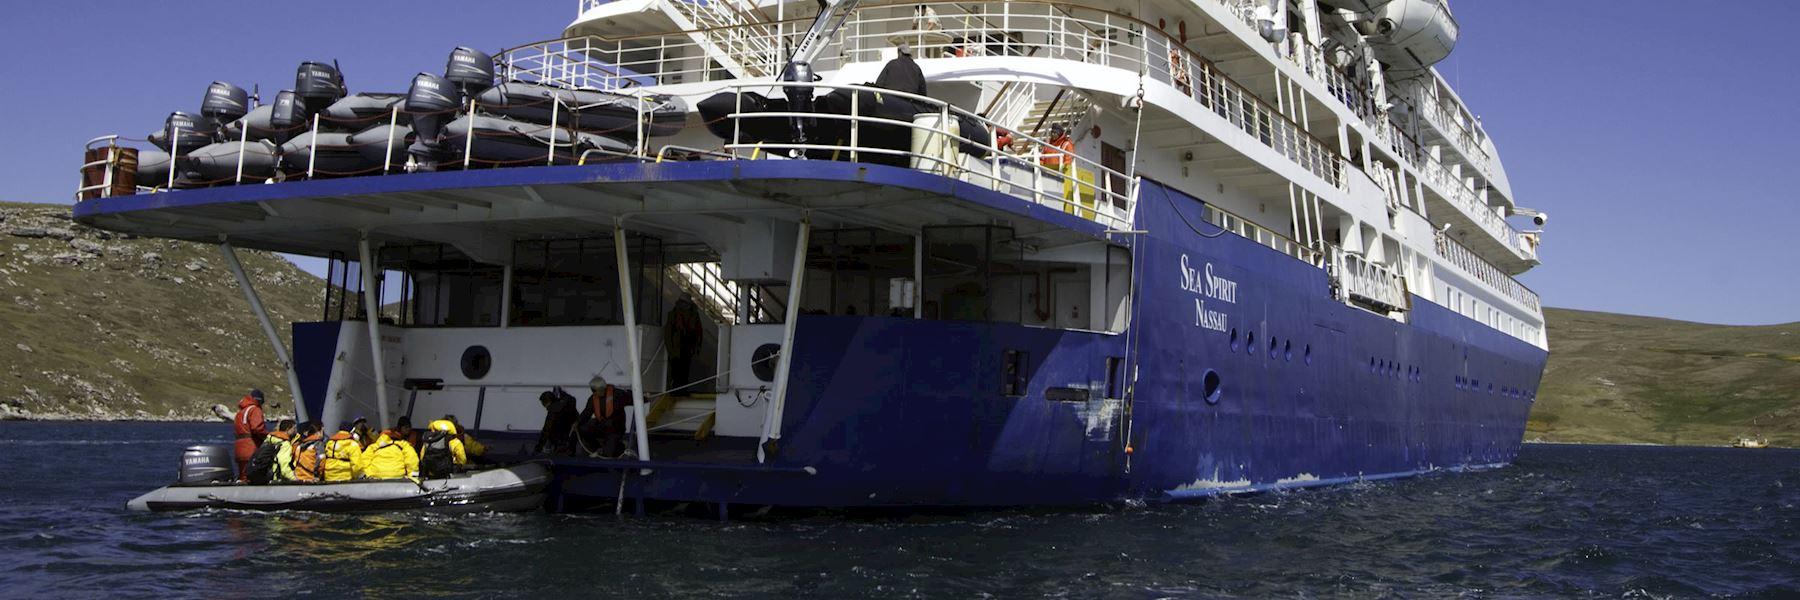 Cruise Ships in The Arctic: Sea Spirit